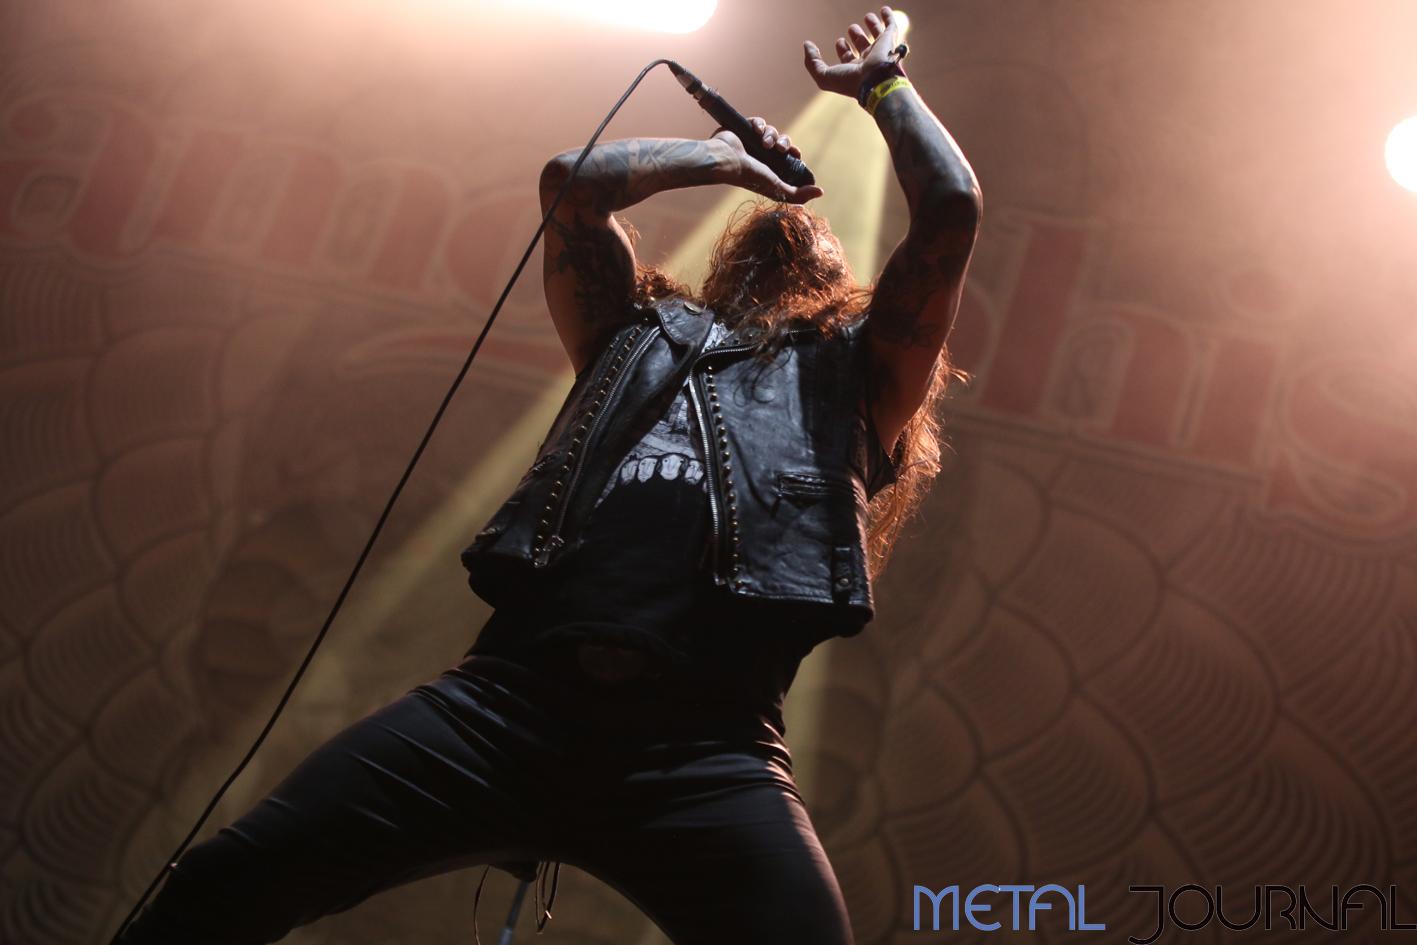 amorphis - leyendas del rock 2018 pic 1